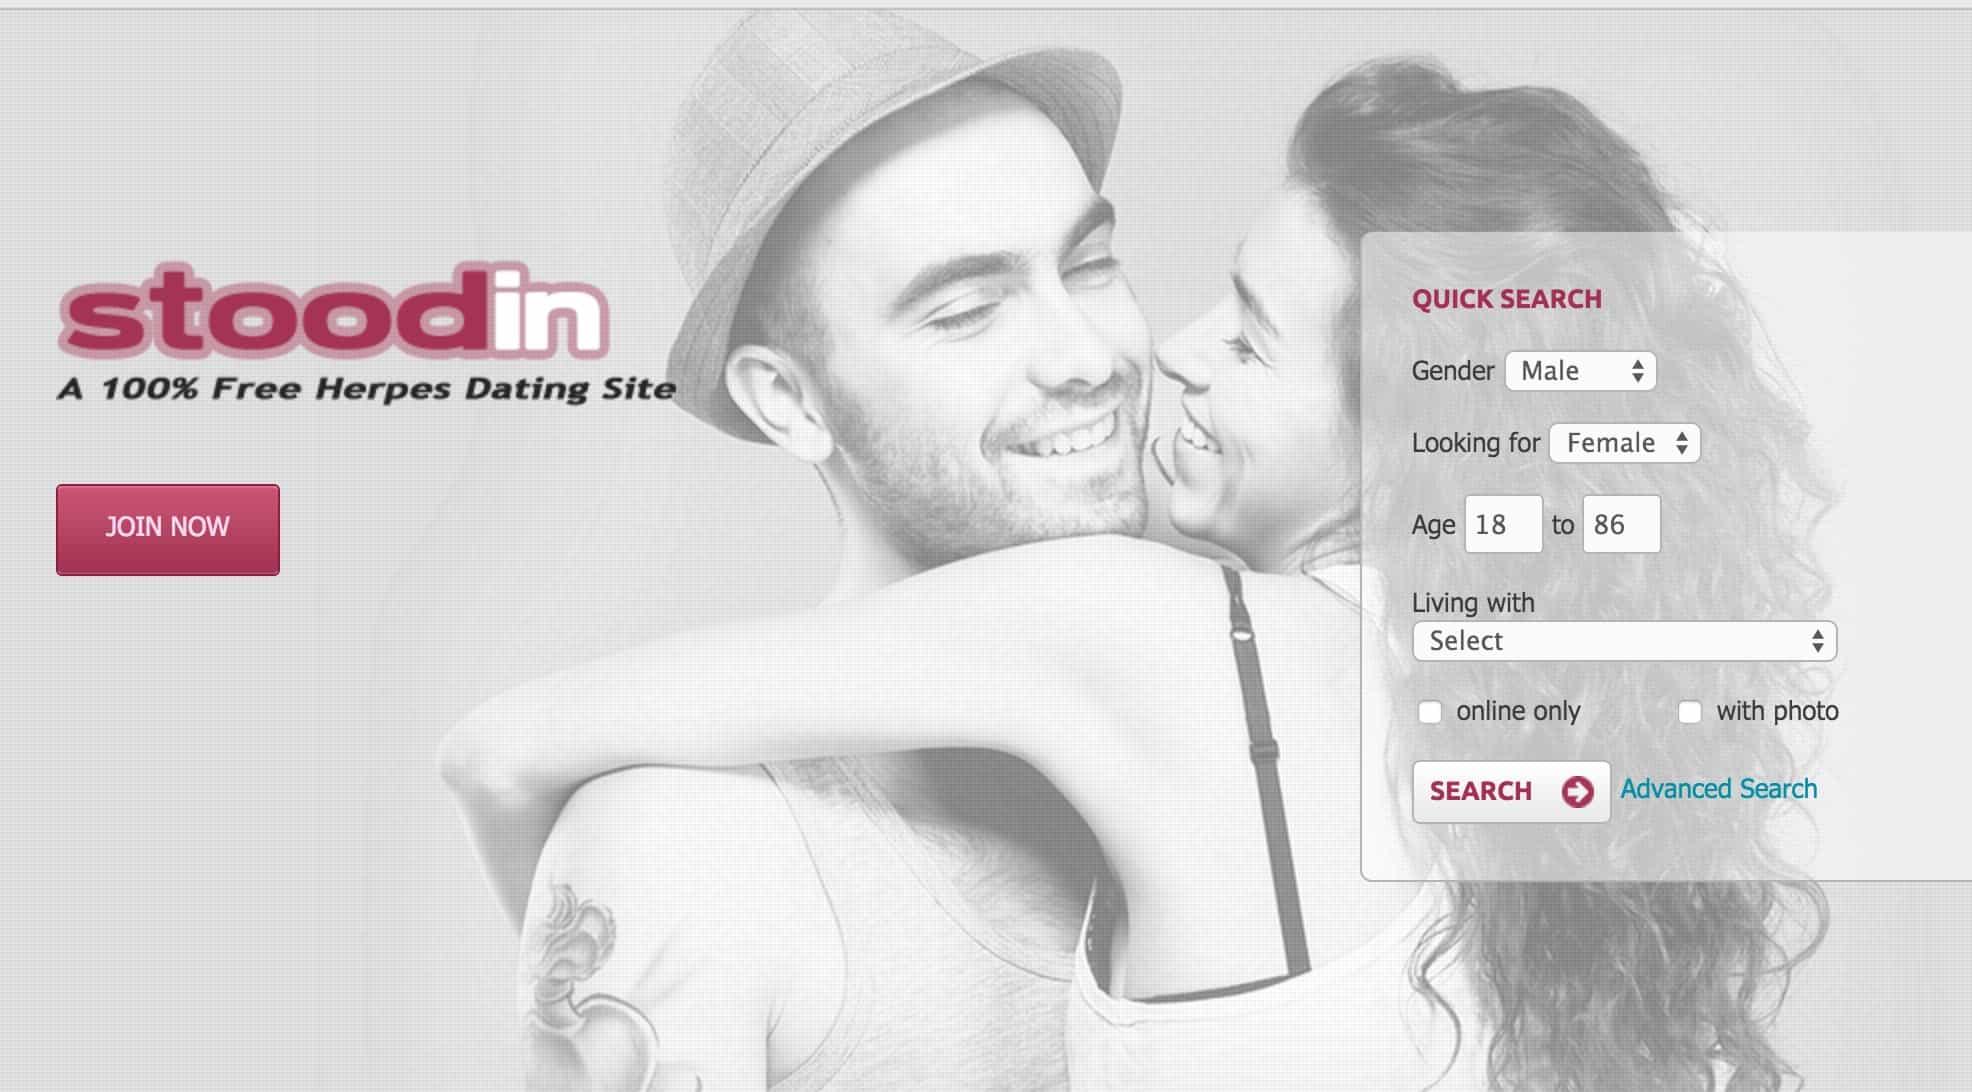 Black herpes Dating Sites